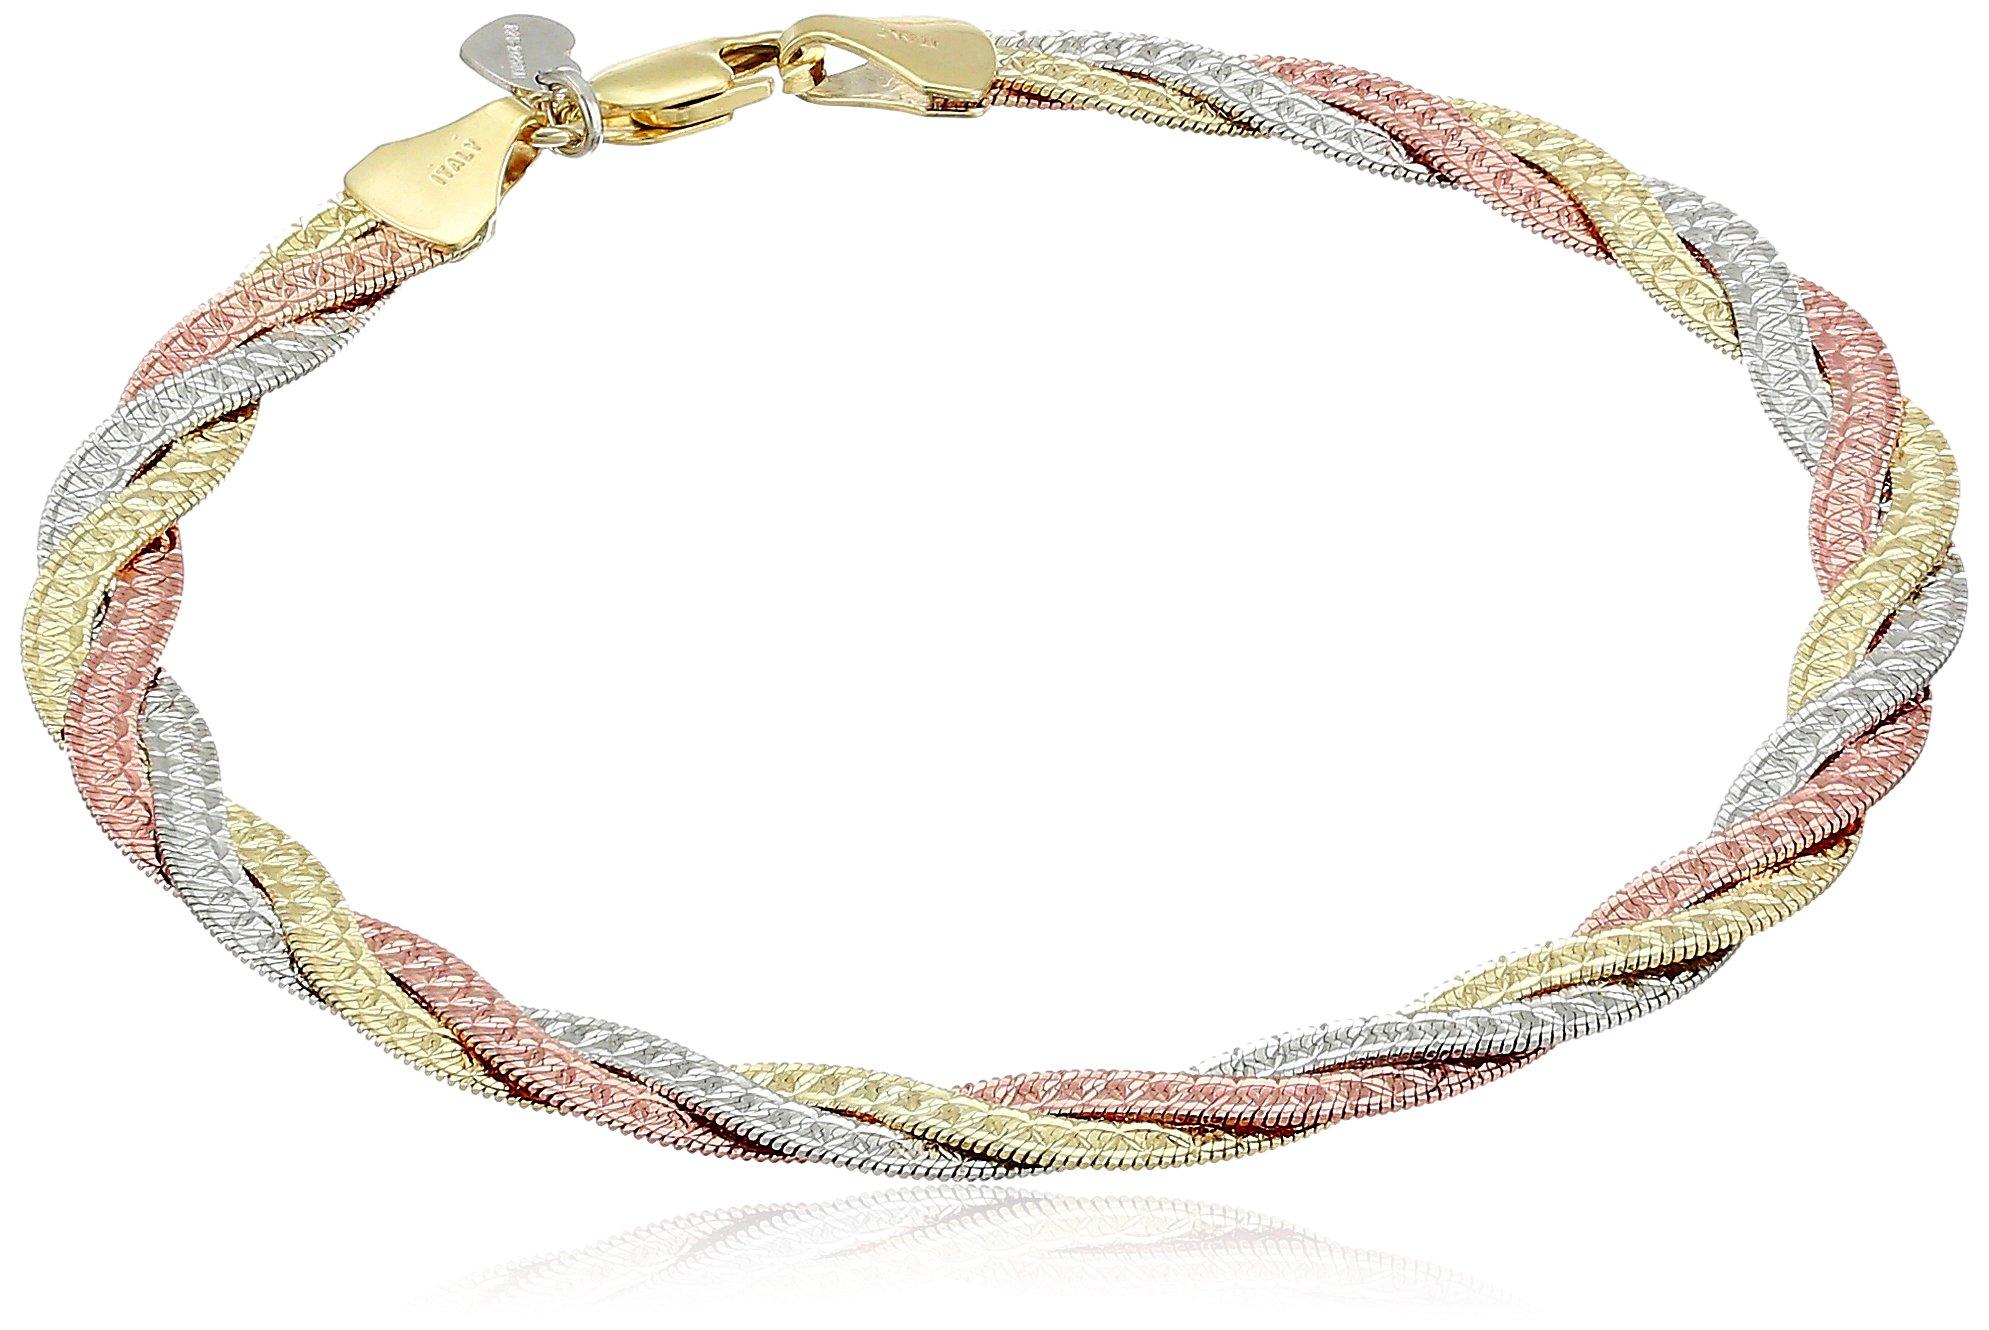 14k Gold Bonded Sterling Silver Tri Colored Braided Bracelet, 7.5''